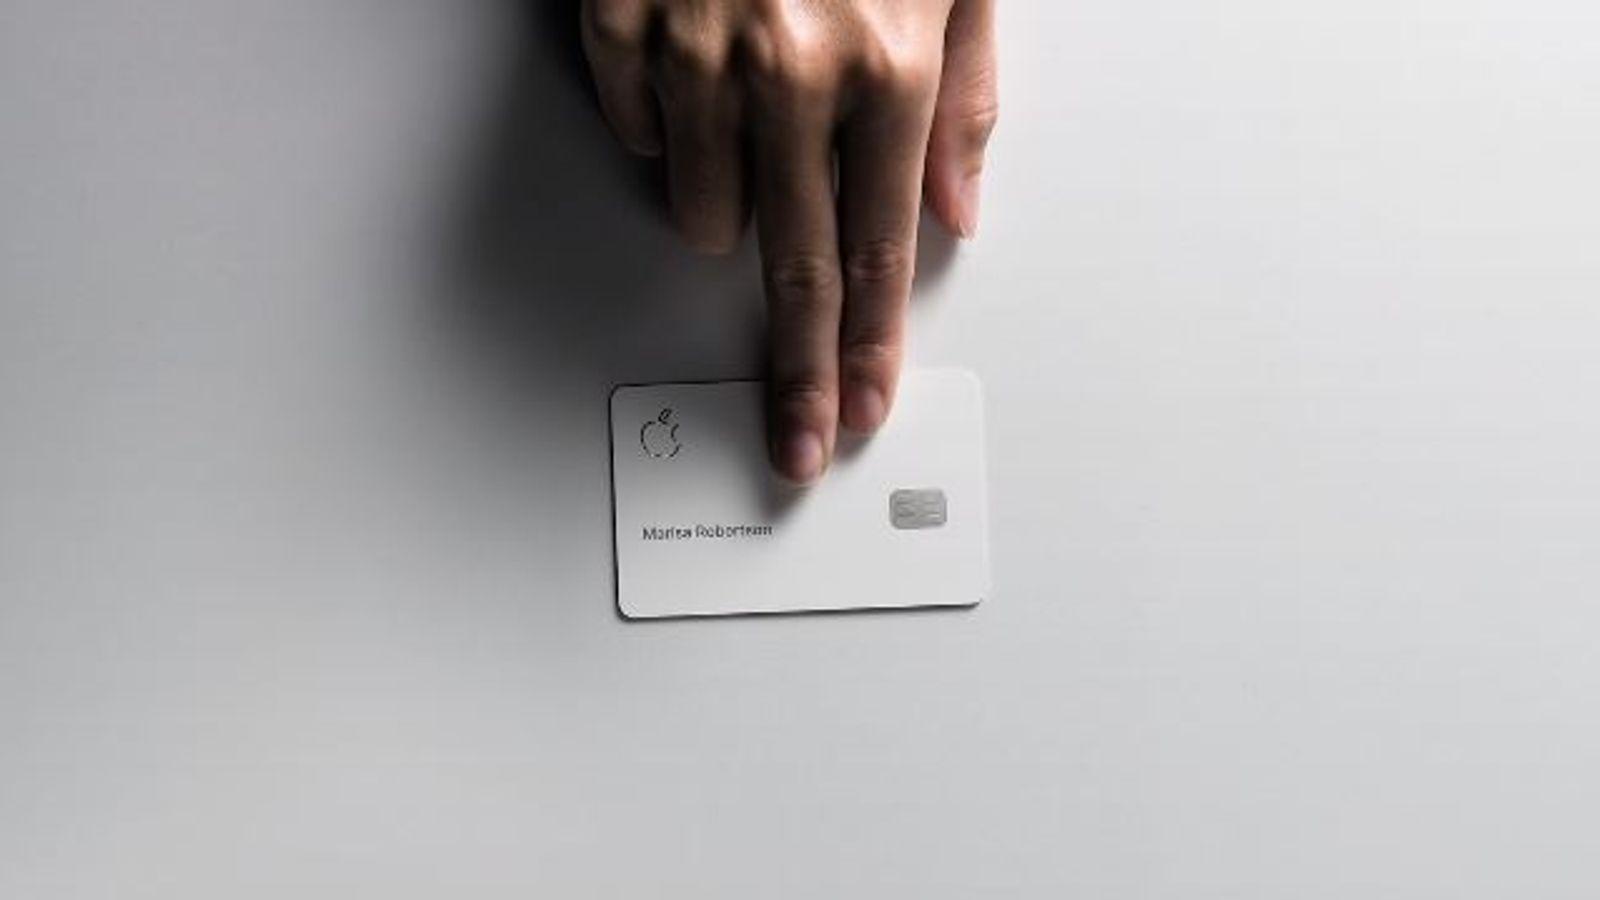 Bite card application